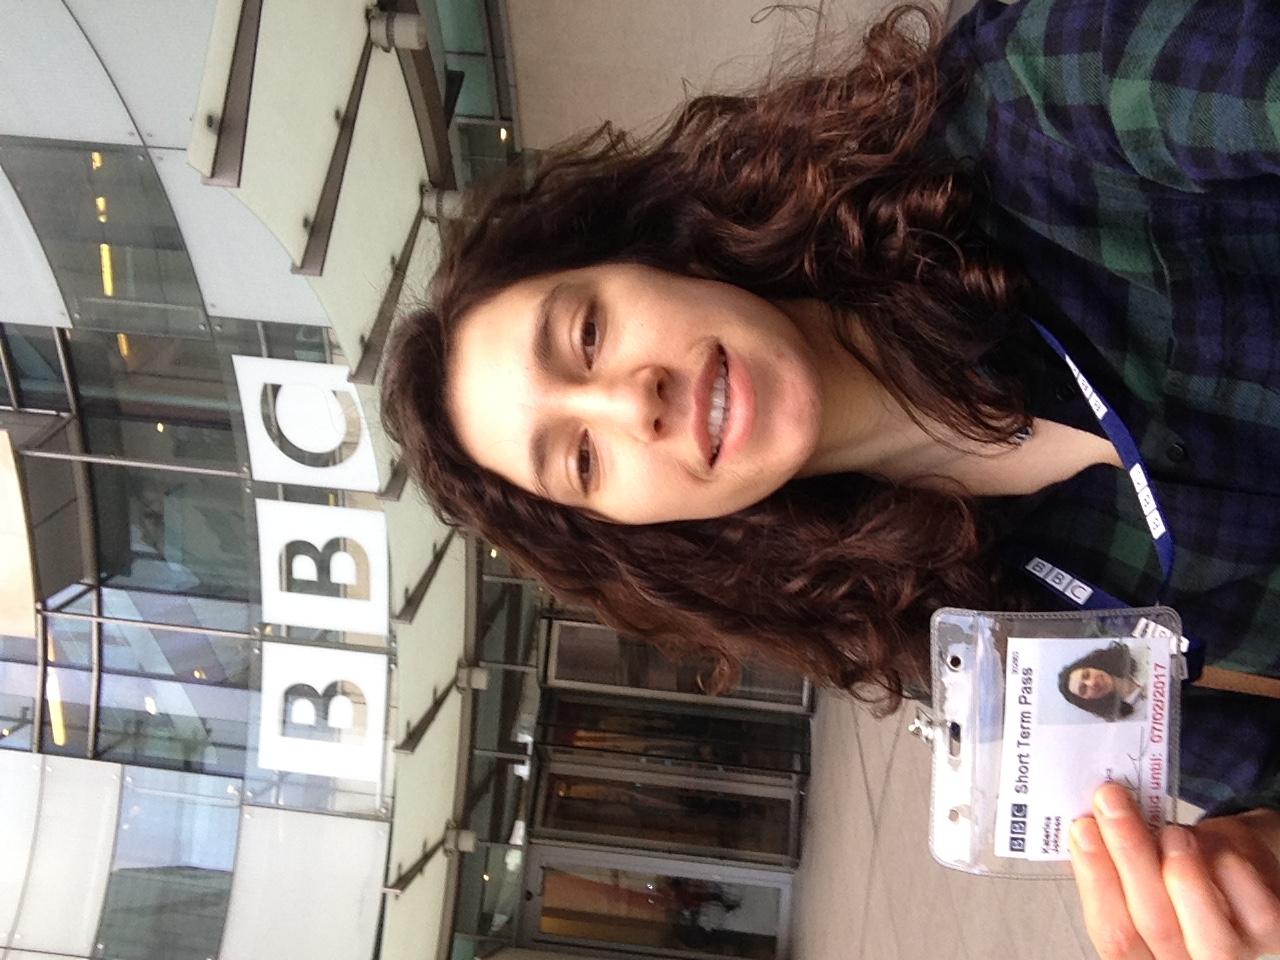 BBC INTERNSHIP